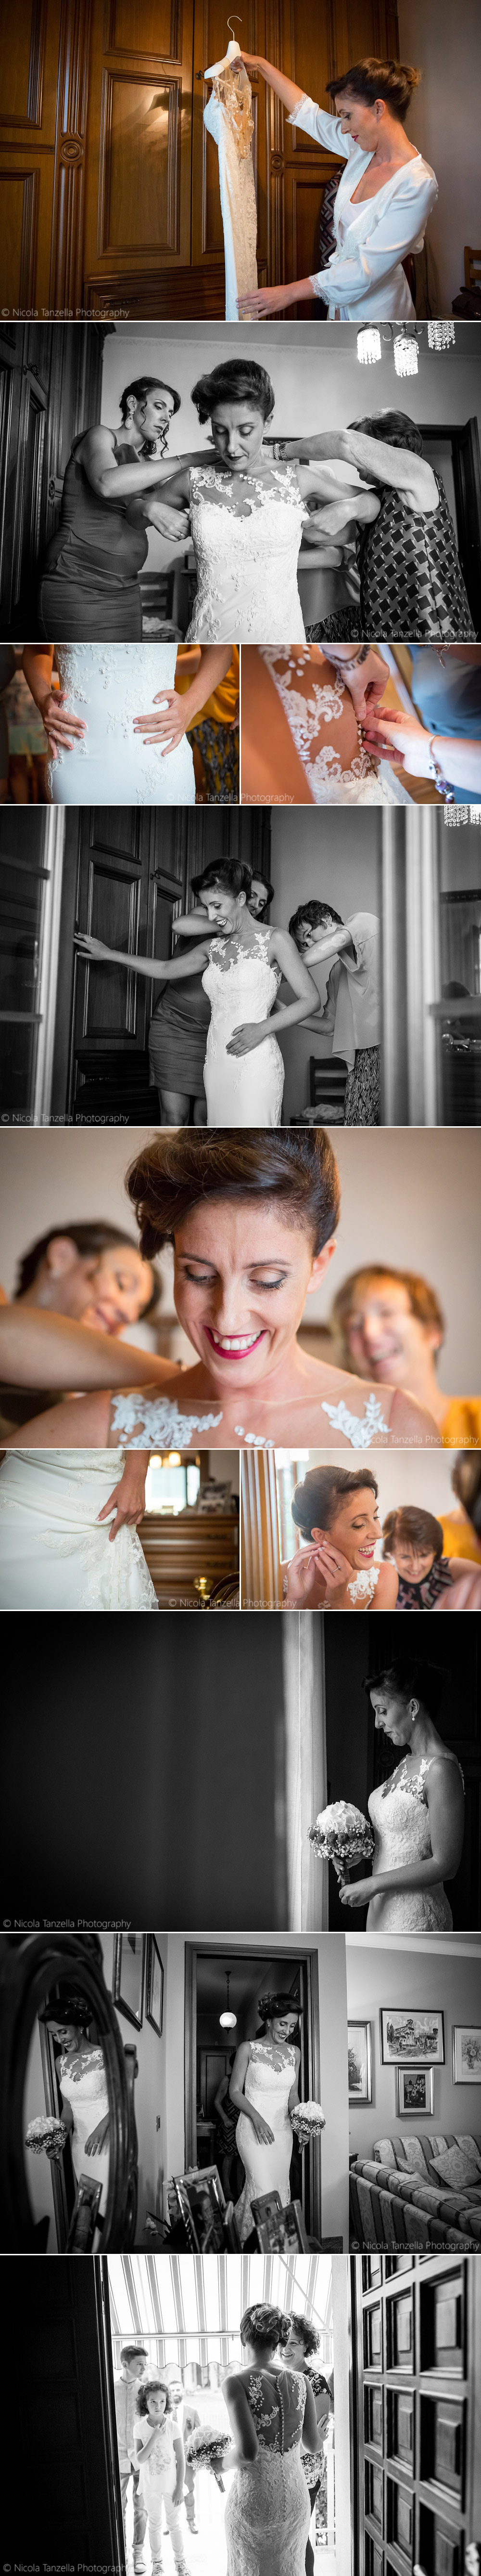 fotografo matrimonio parma-4